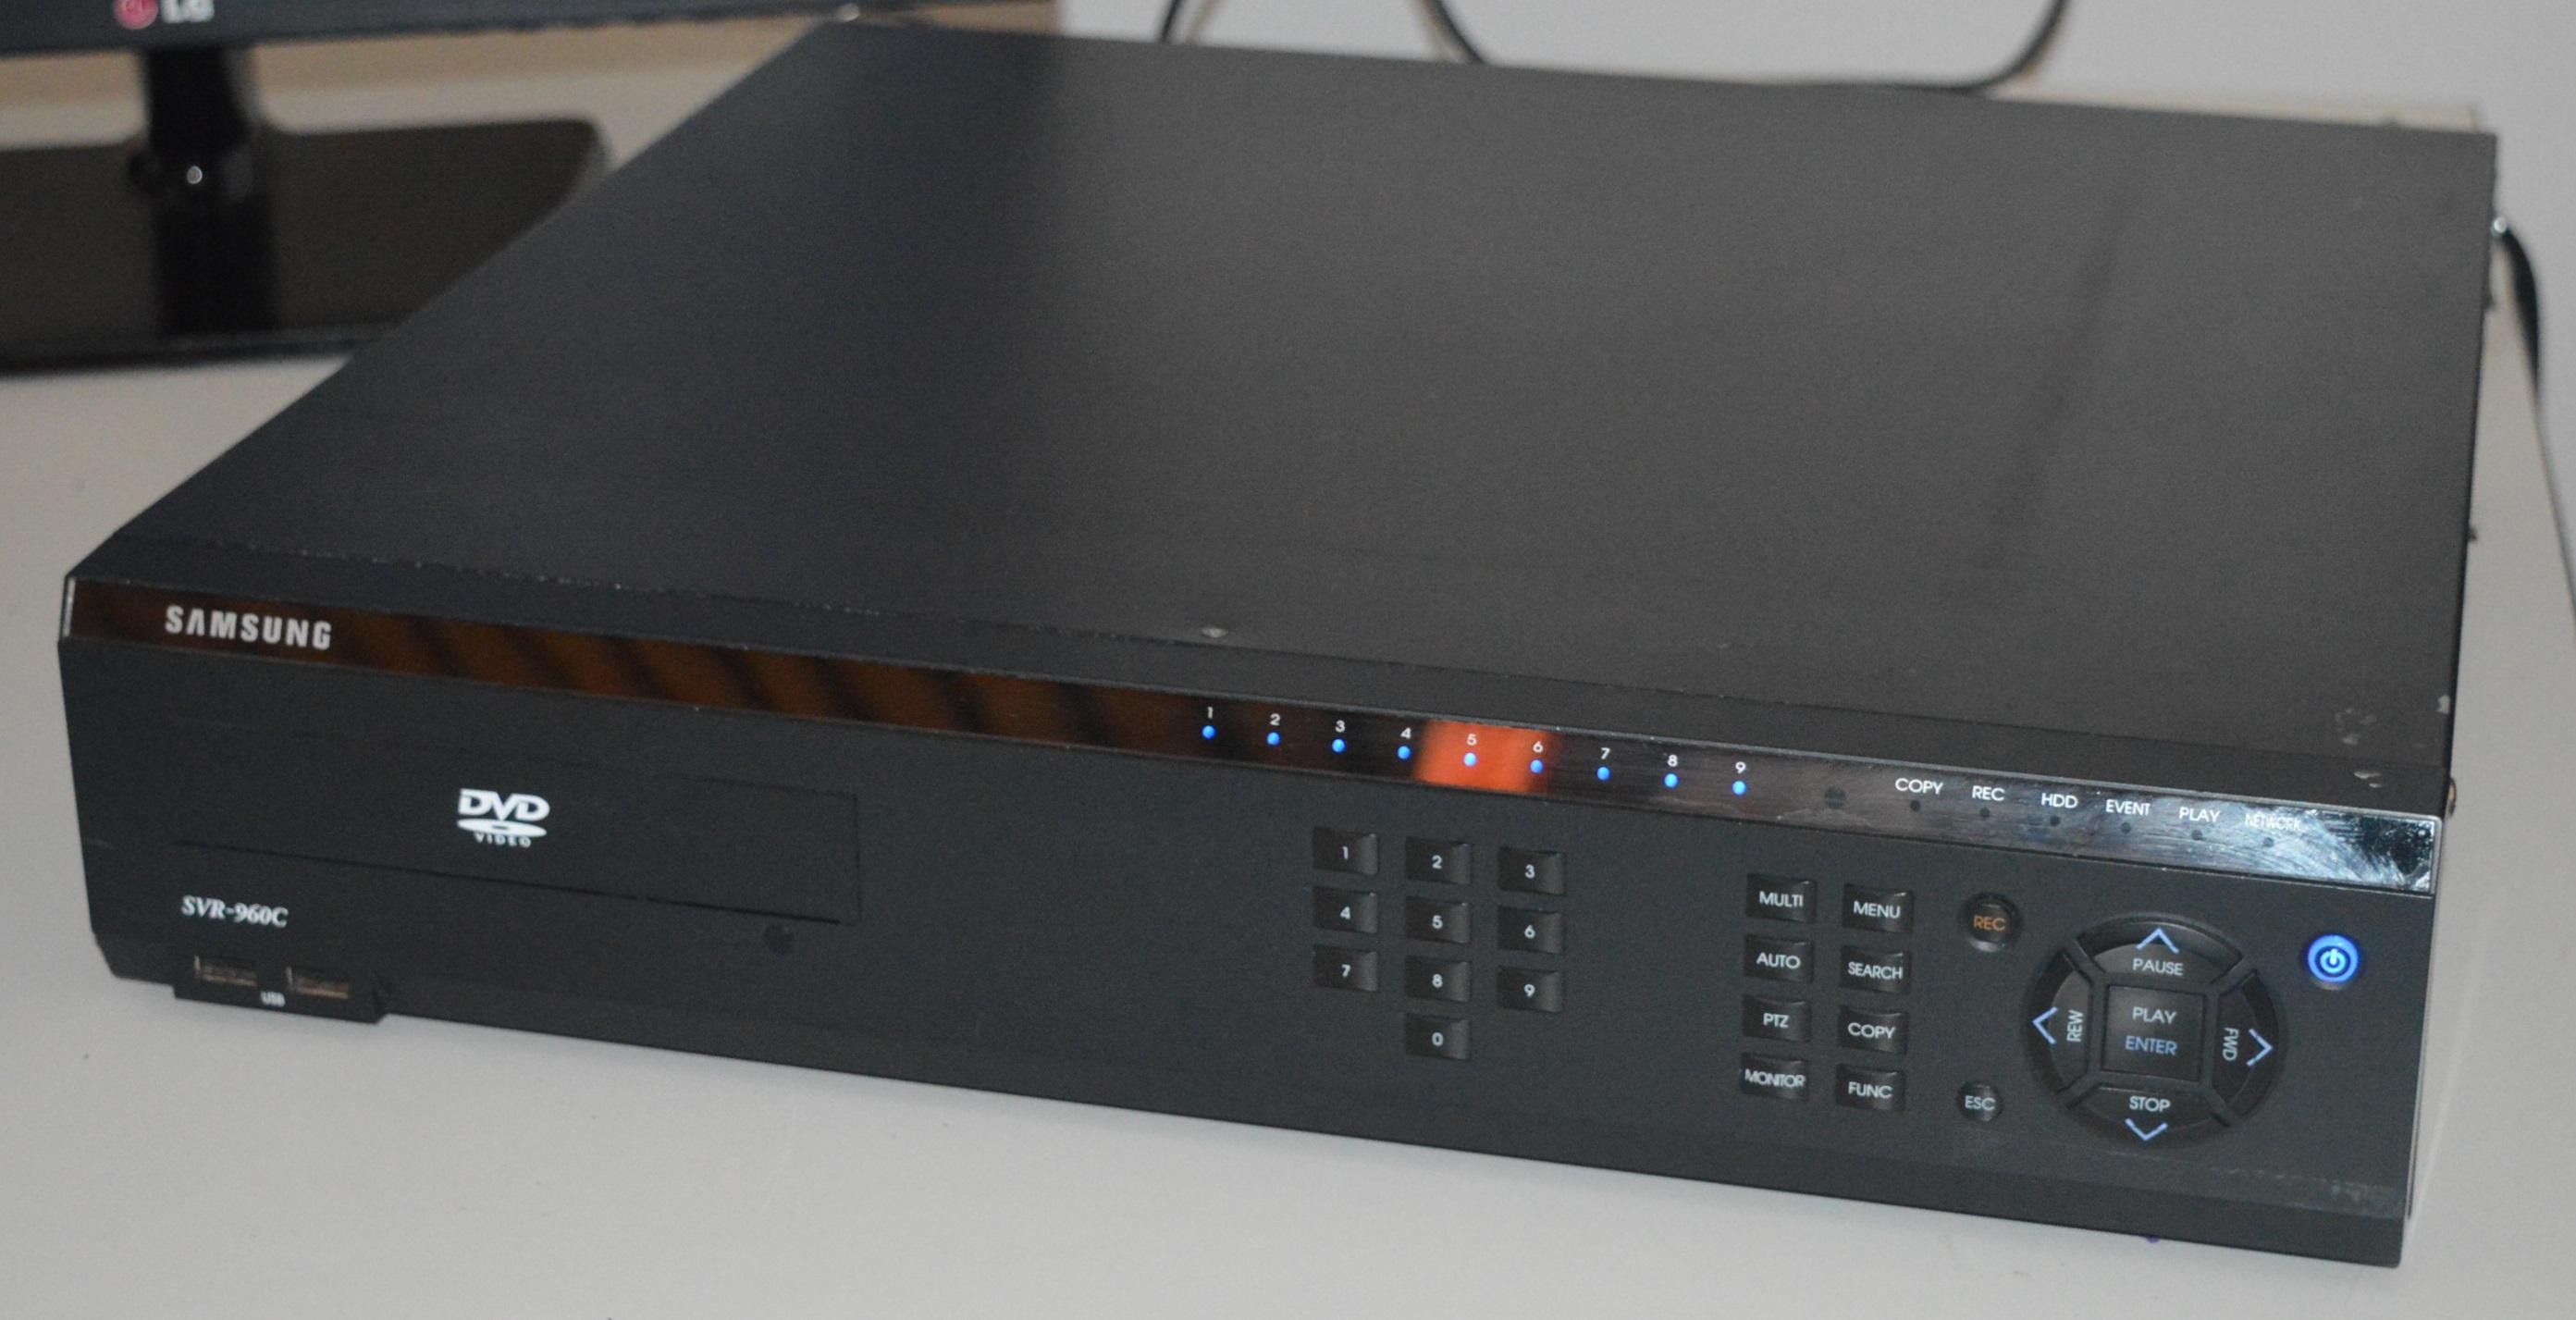 1 x samsung cctv digital video recorder svr 960c 5tb hard drive rh bidspotter co uk Samsung SCH U960 Samsung Rogue Apps